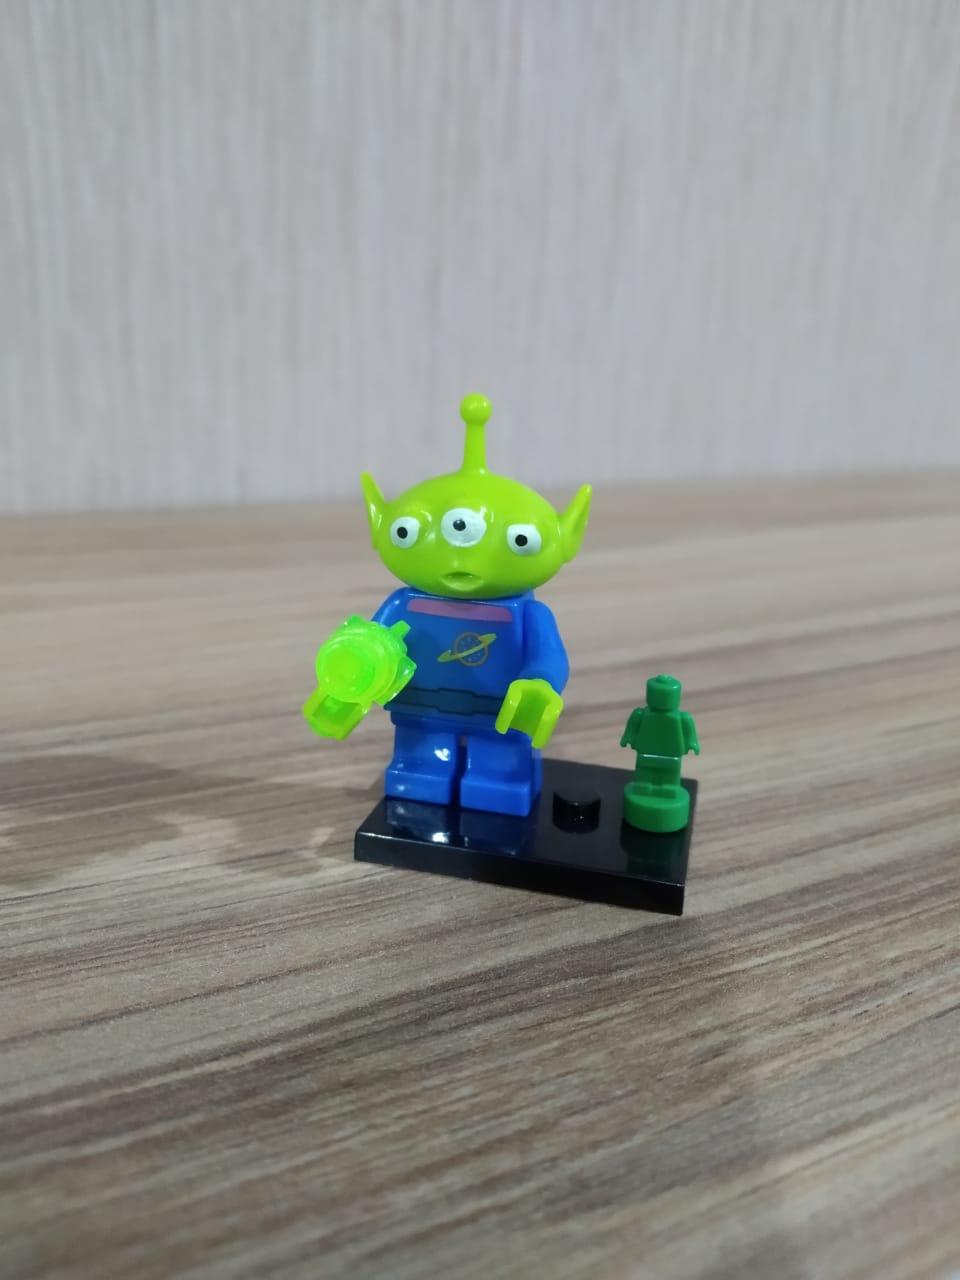 LEGO: Alien - Toy Story